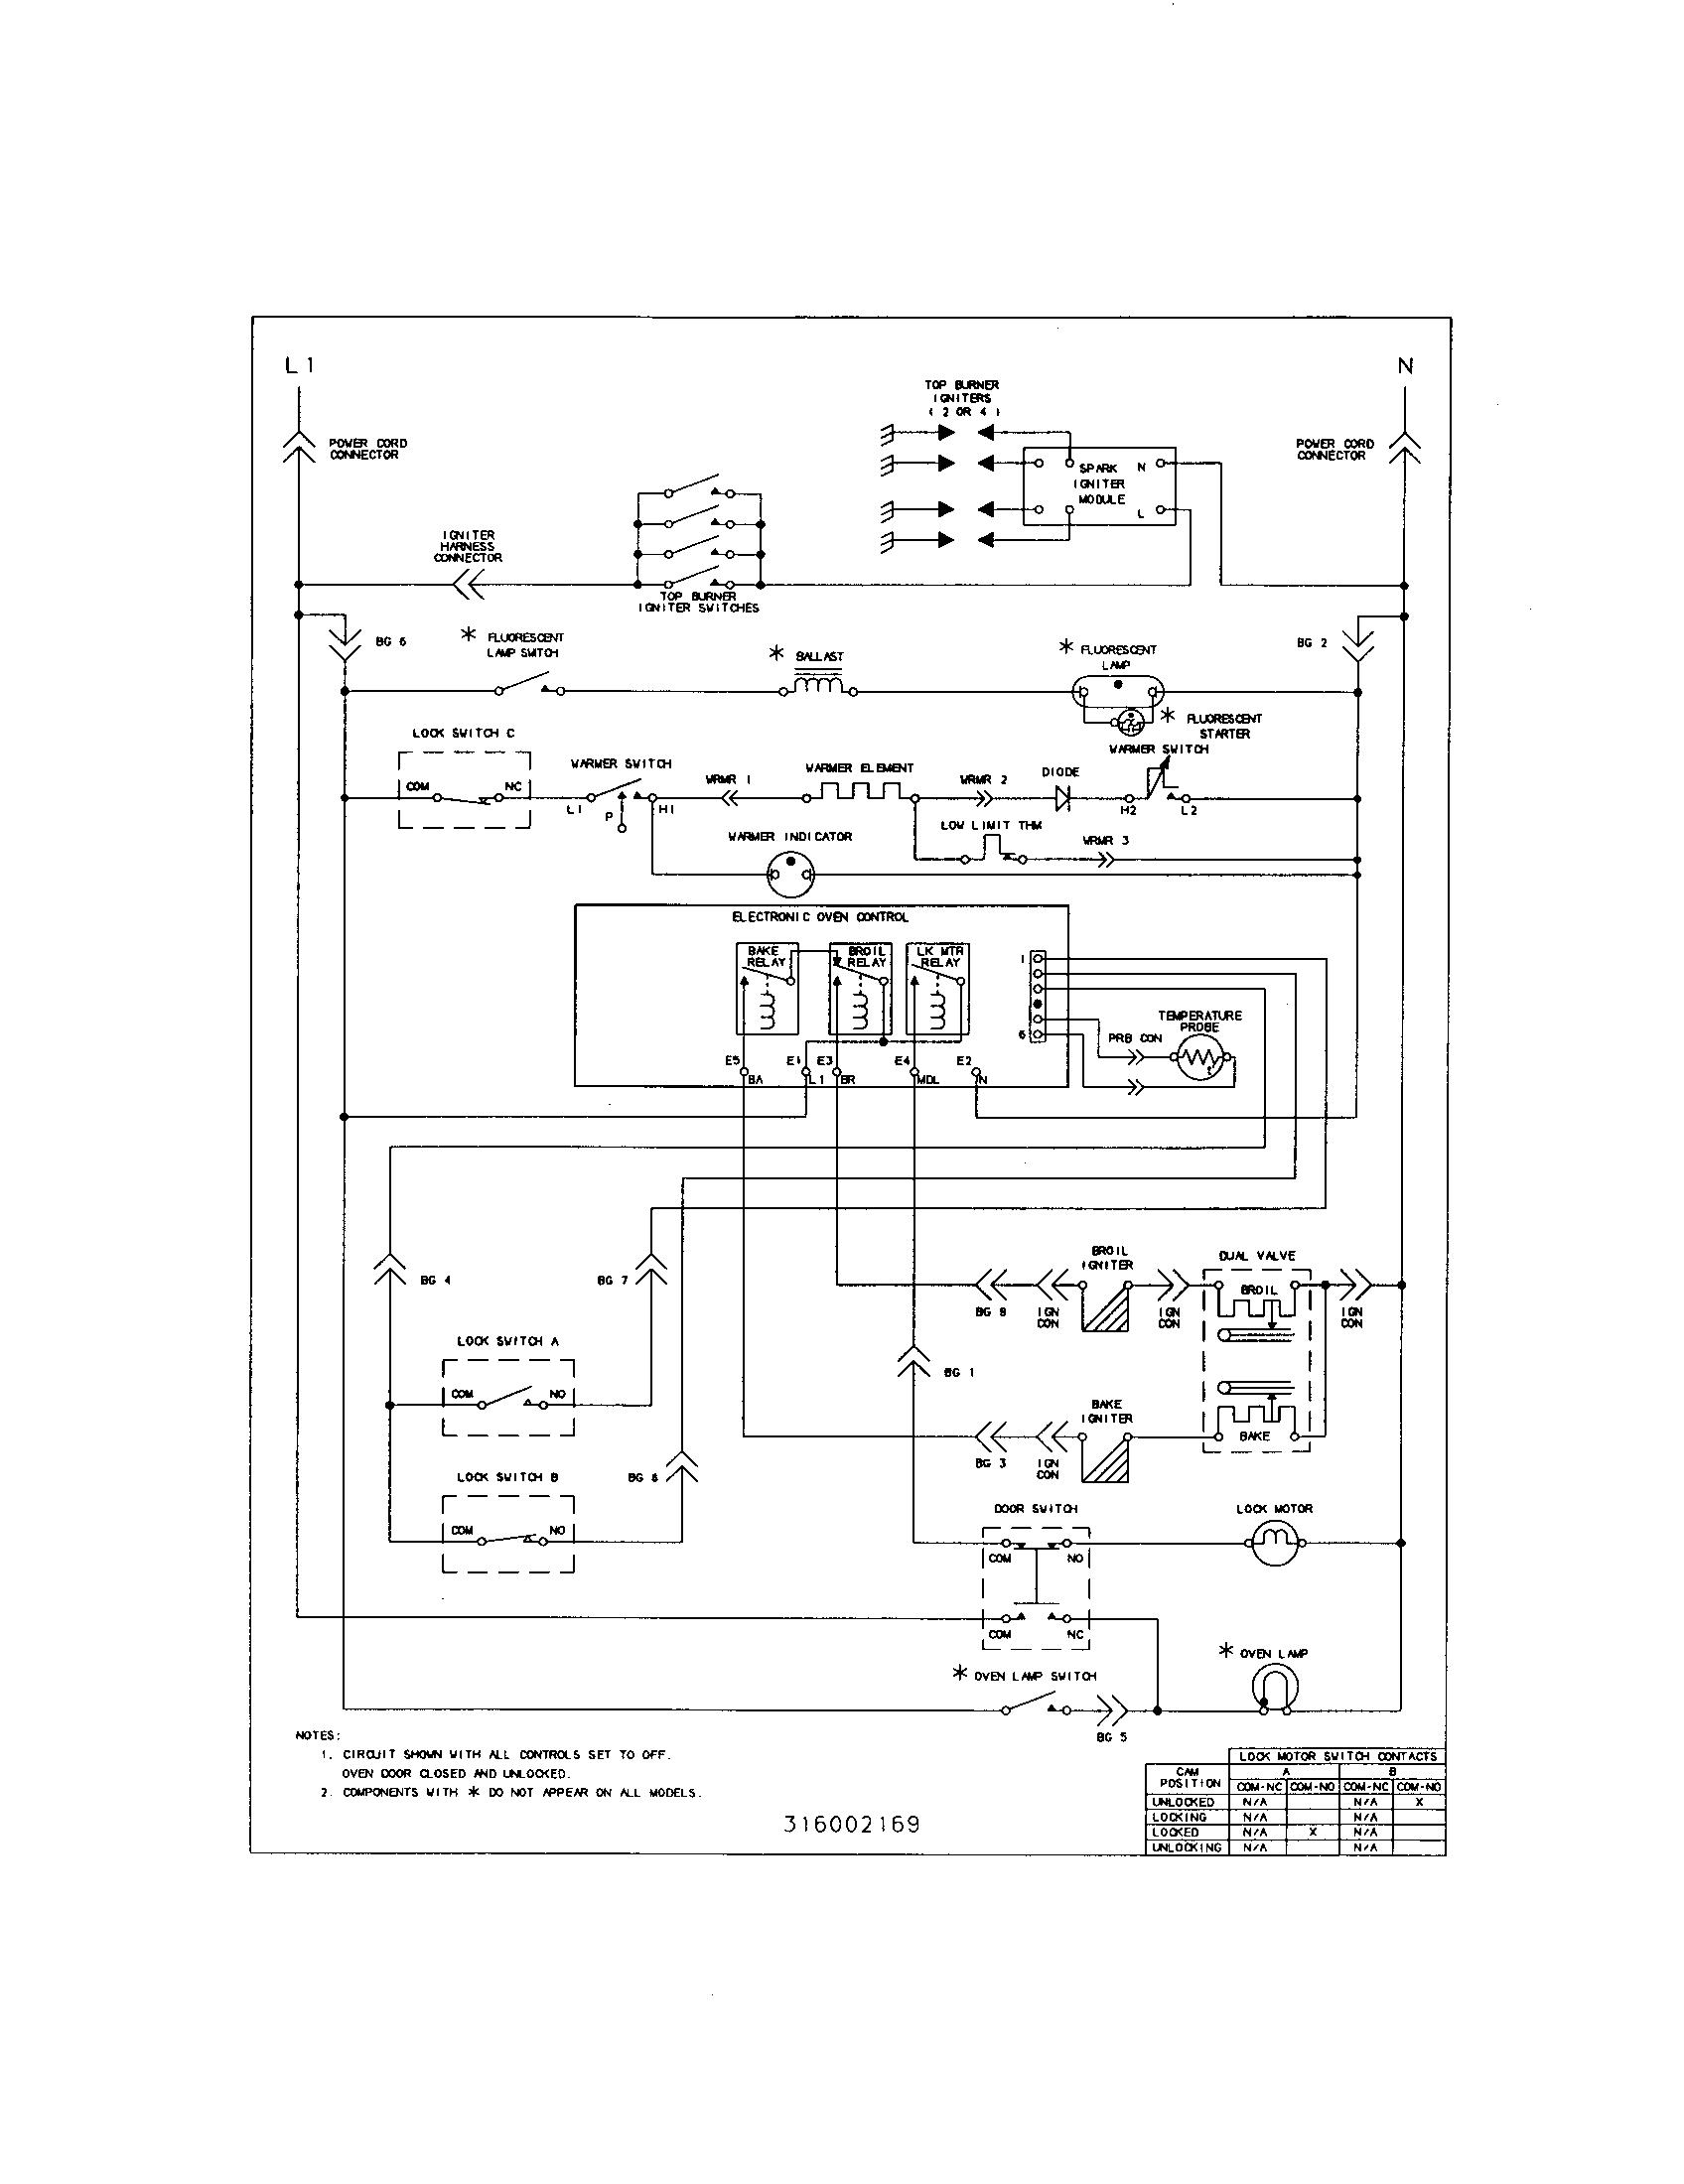 Kenmore gas range parts model 79075761001 sears partsdirect kenmore oven wiring diagram 7… washing machine